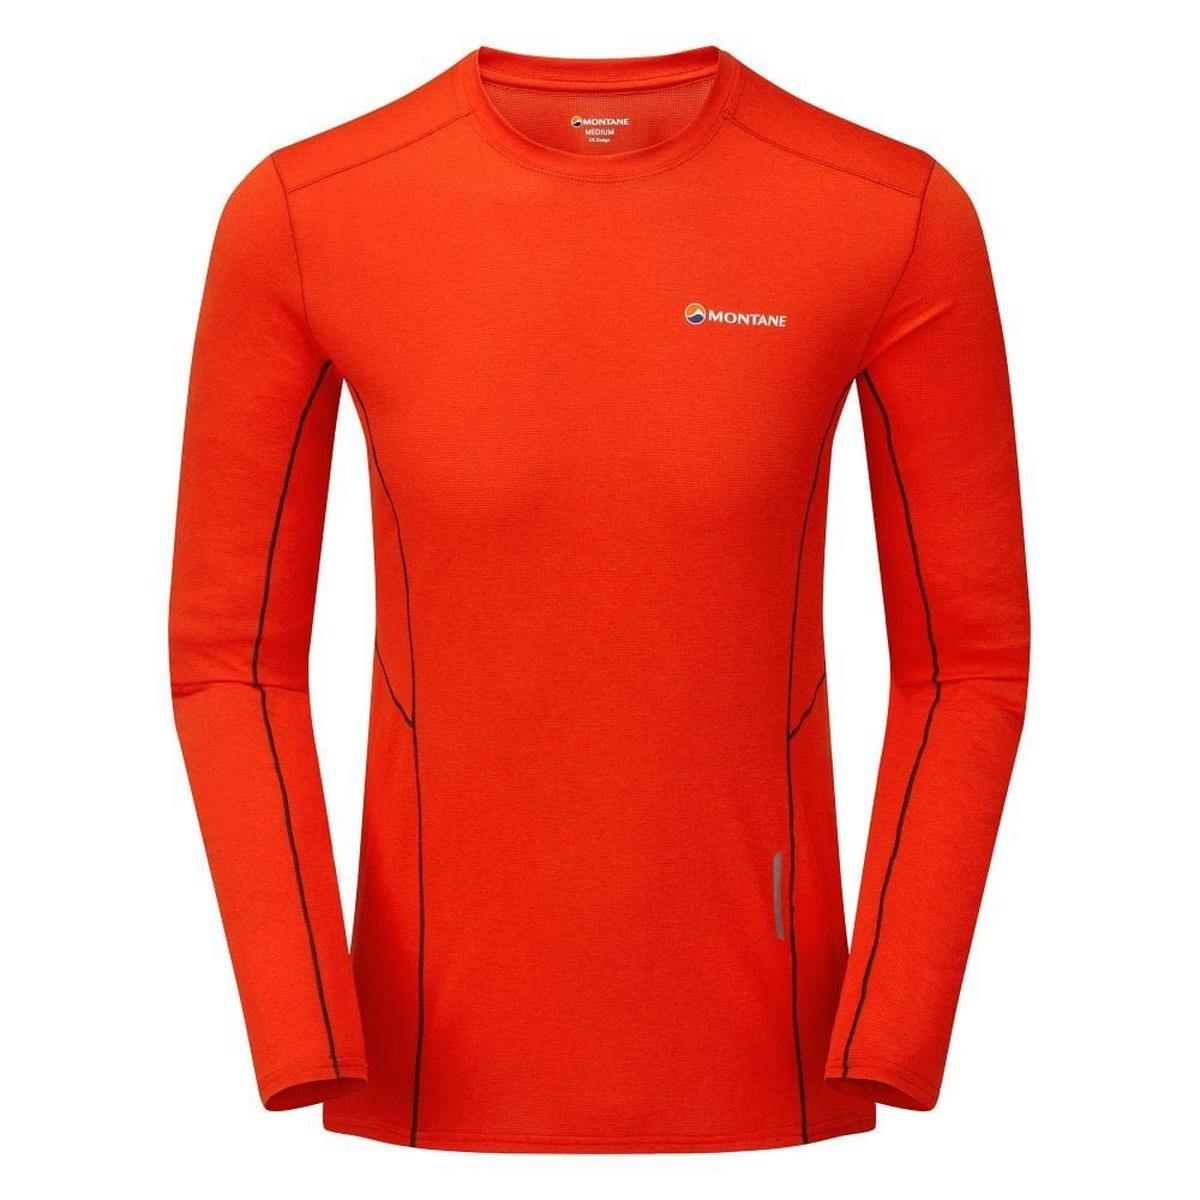 Montane Men's Sabre Long Sleeved T-Shirt - Flag Red